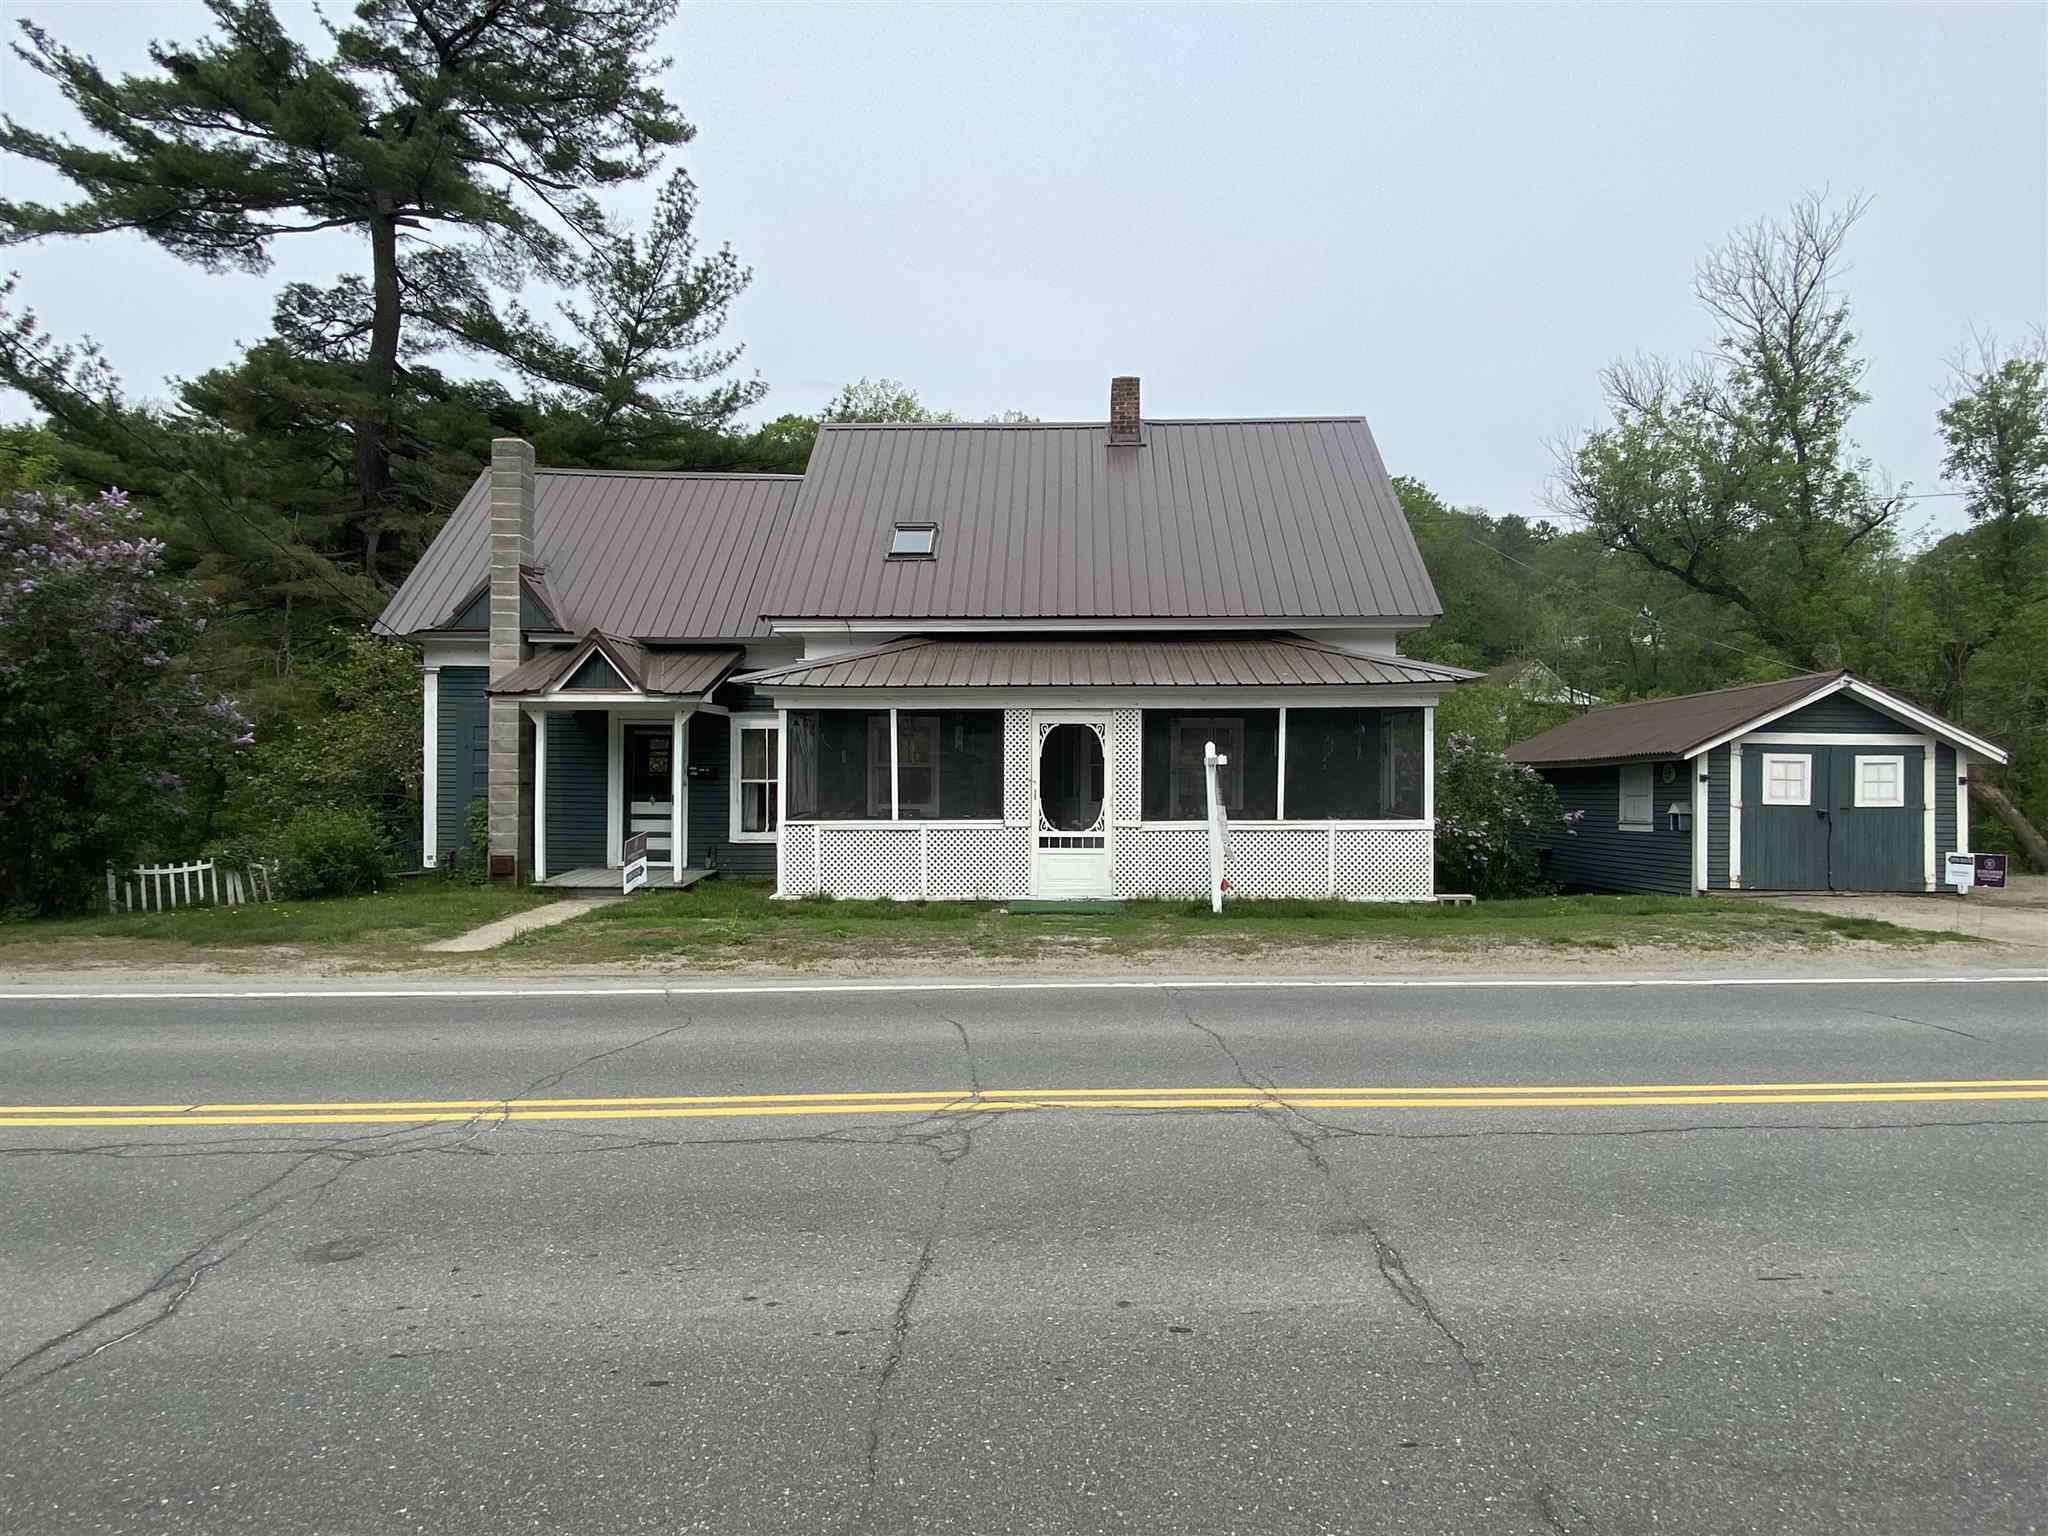 Photo of 336 South Main Street Landaff NH 03585